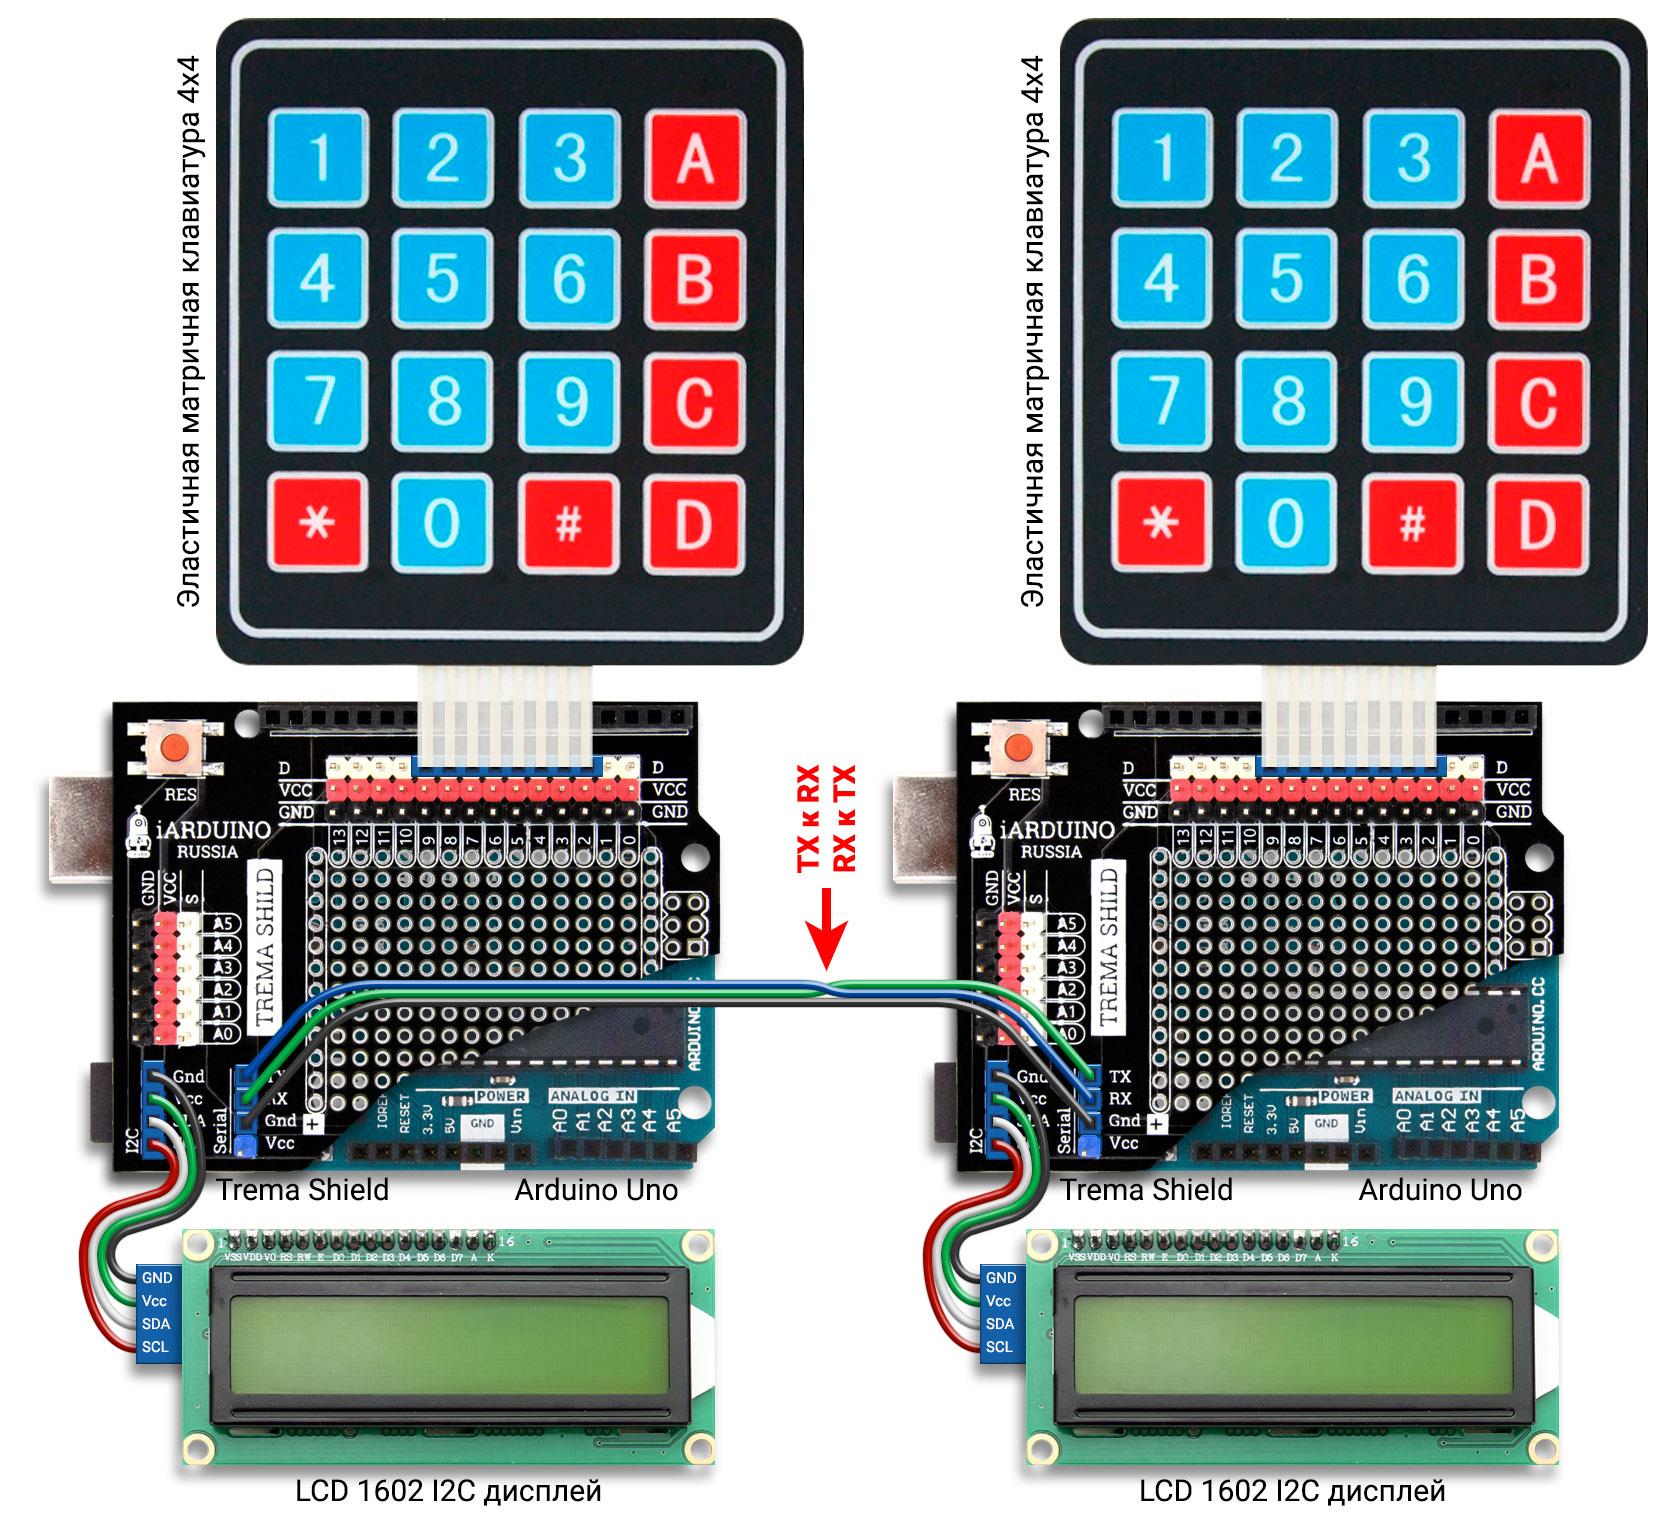 Схема соединения двух Arduino Uno по шине UART